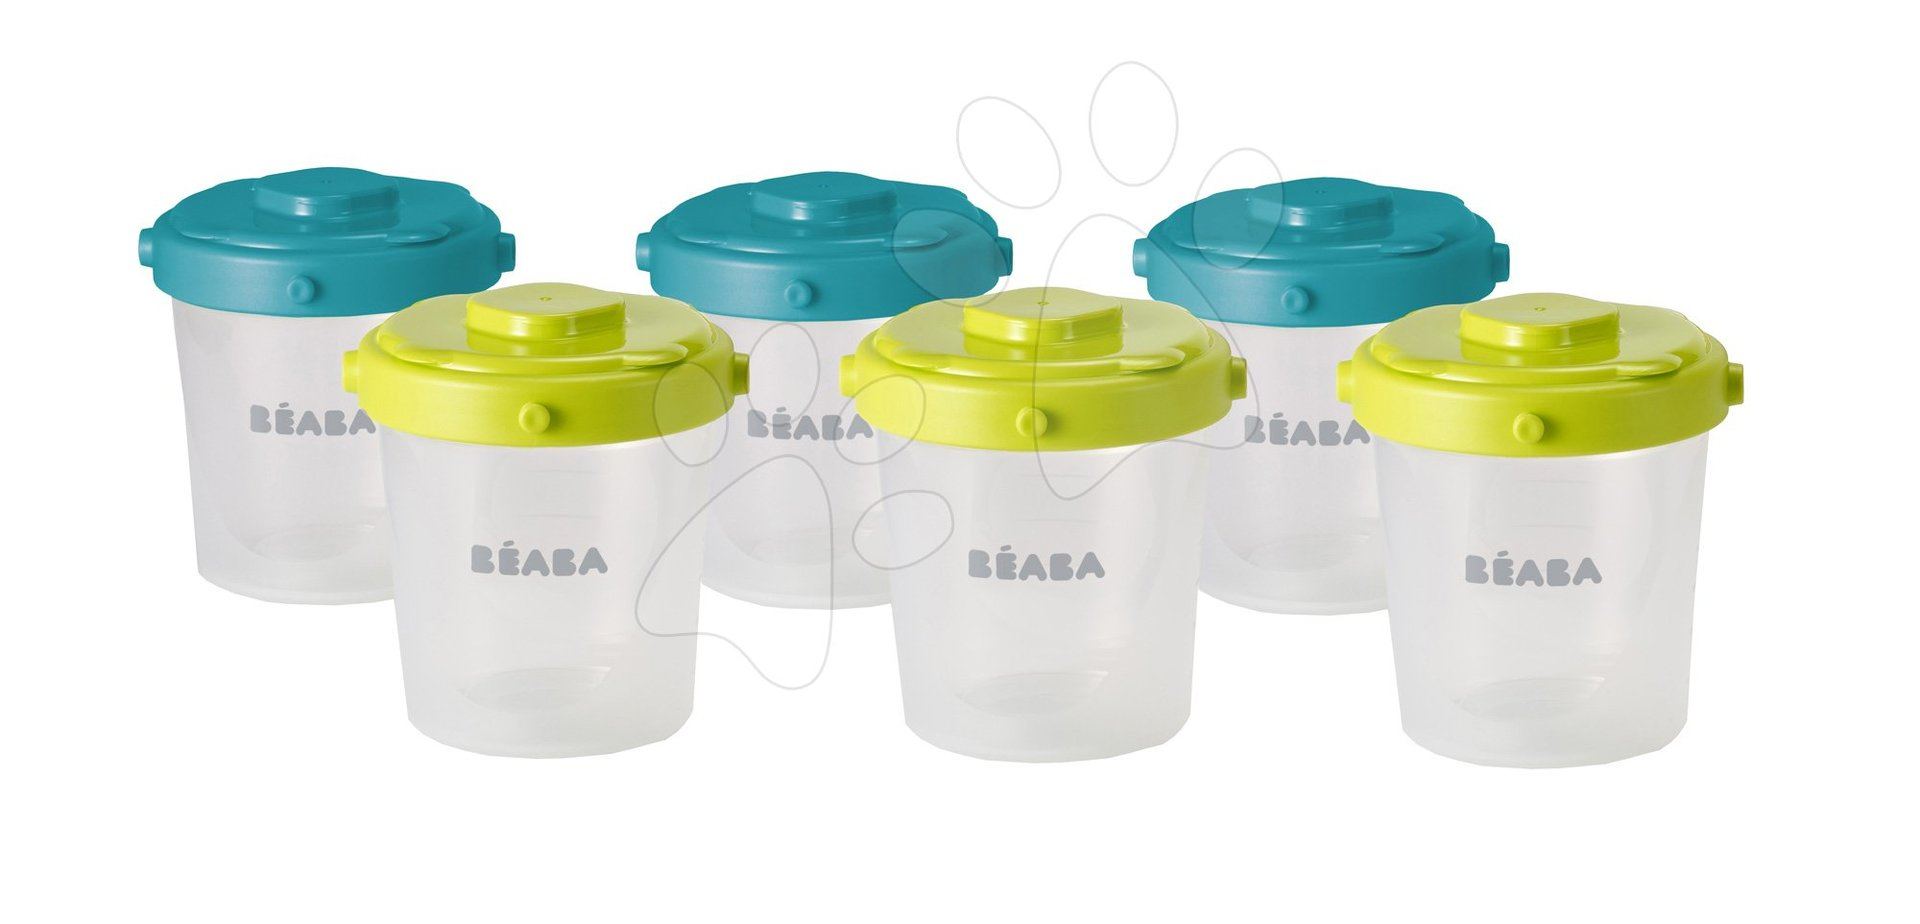 Beaba sada 6 dóz na jedlo 6 clip 200 ml 912482 modrá a neón